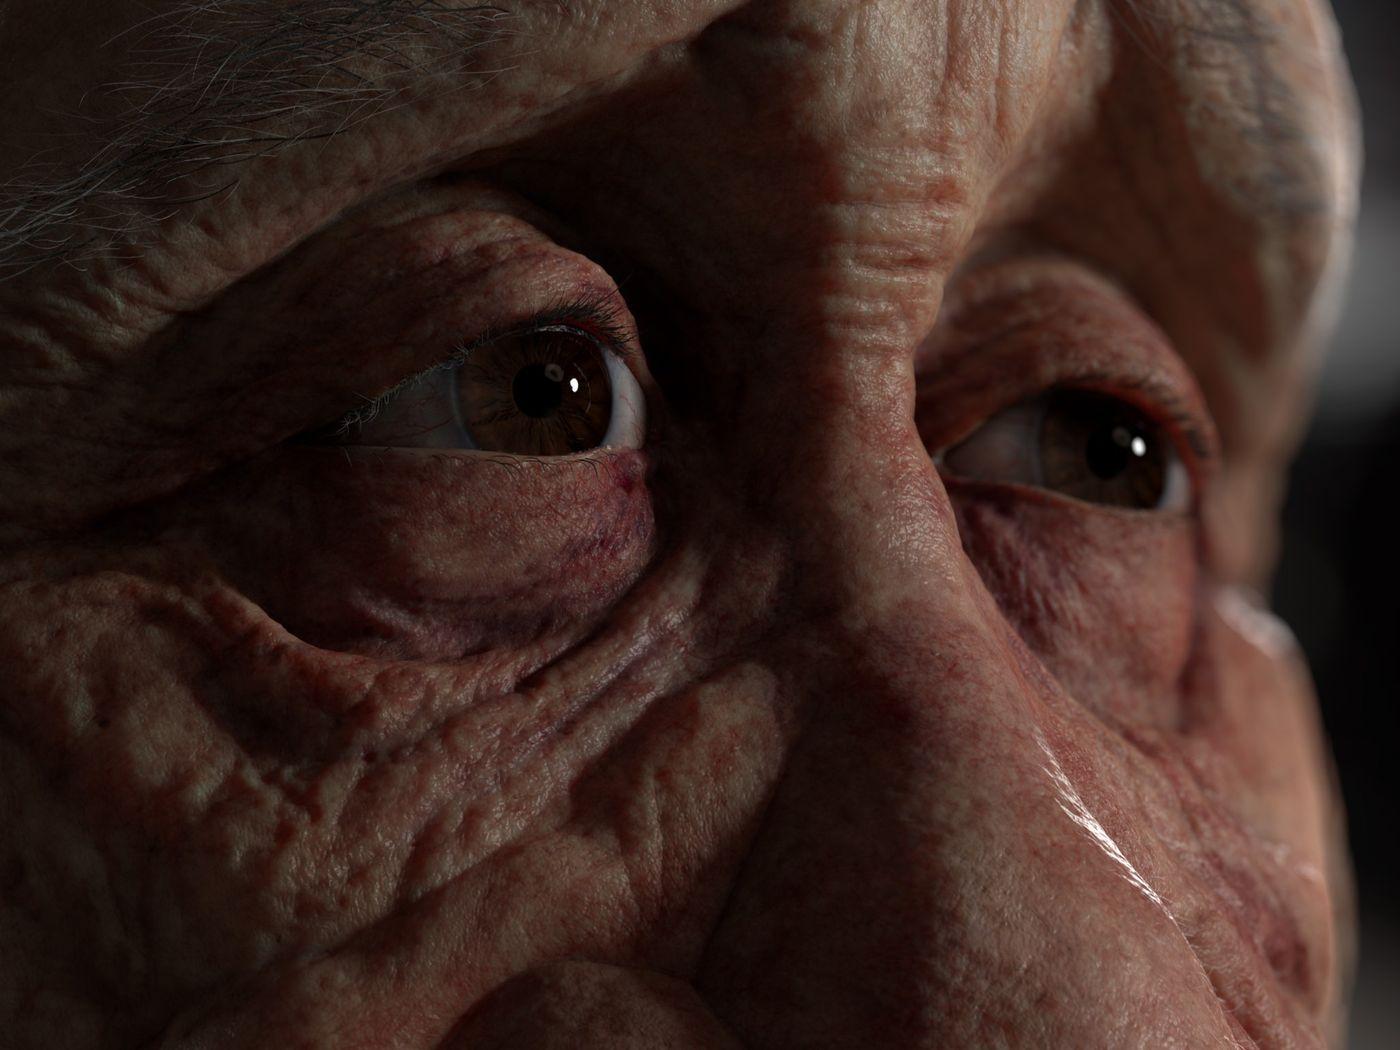 Old Man - Skin Case Study